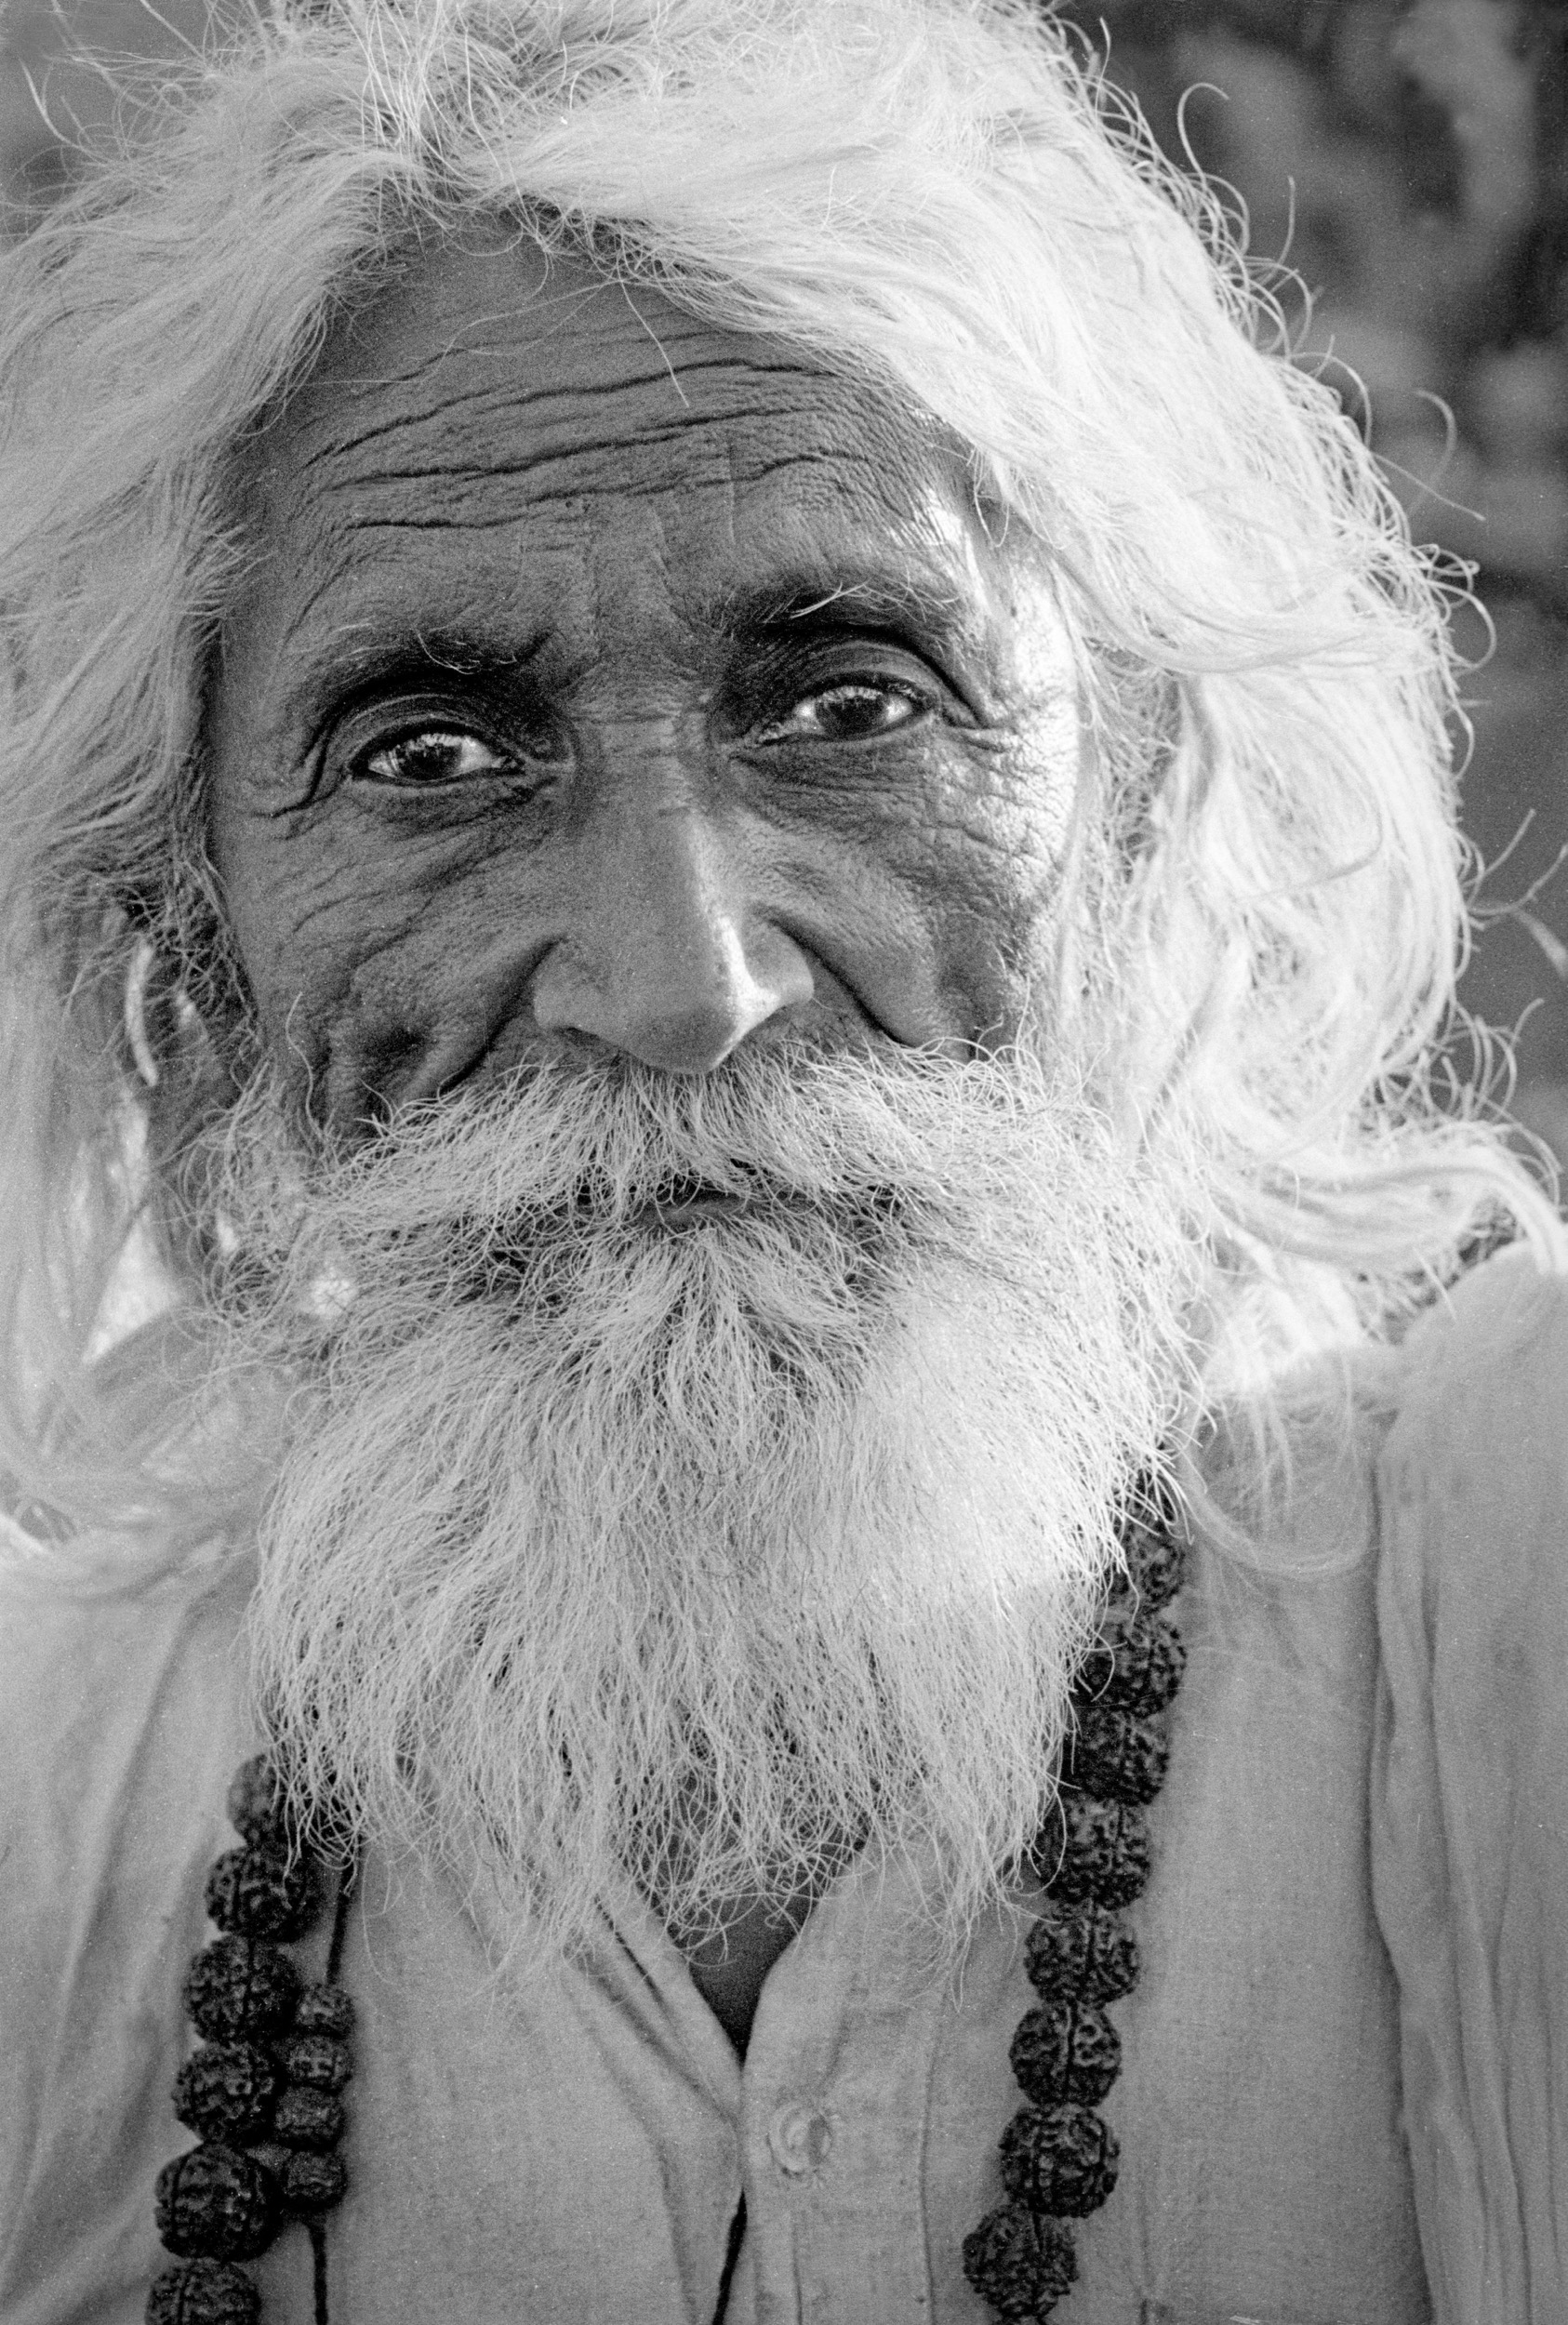 Rajasthan, India :: 1985